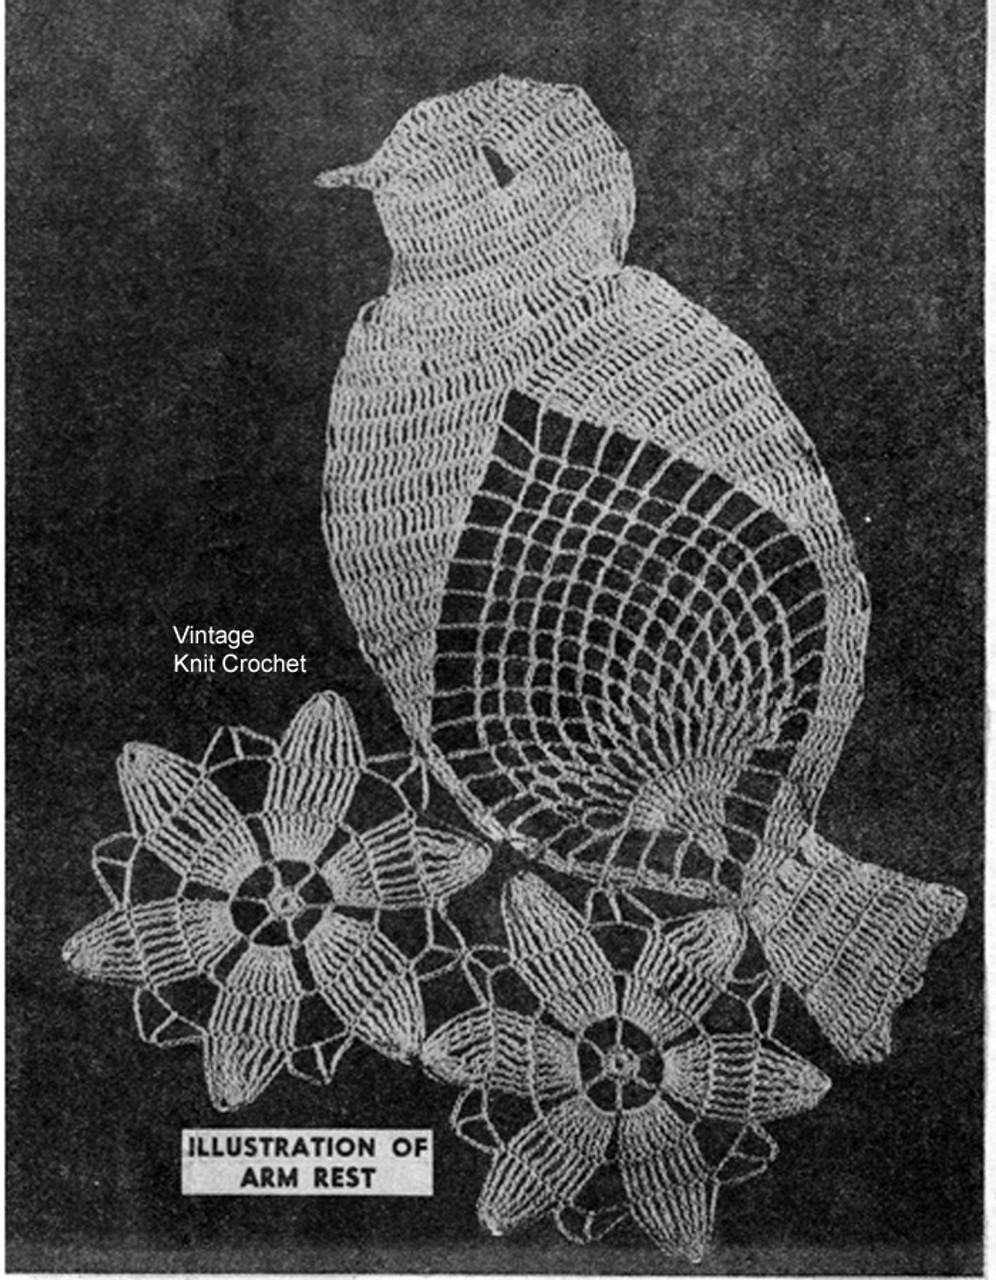 Daisy Bird Crochet Pattern Stitch Illustration, Mail Order 3164